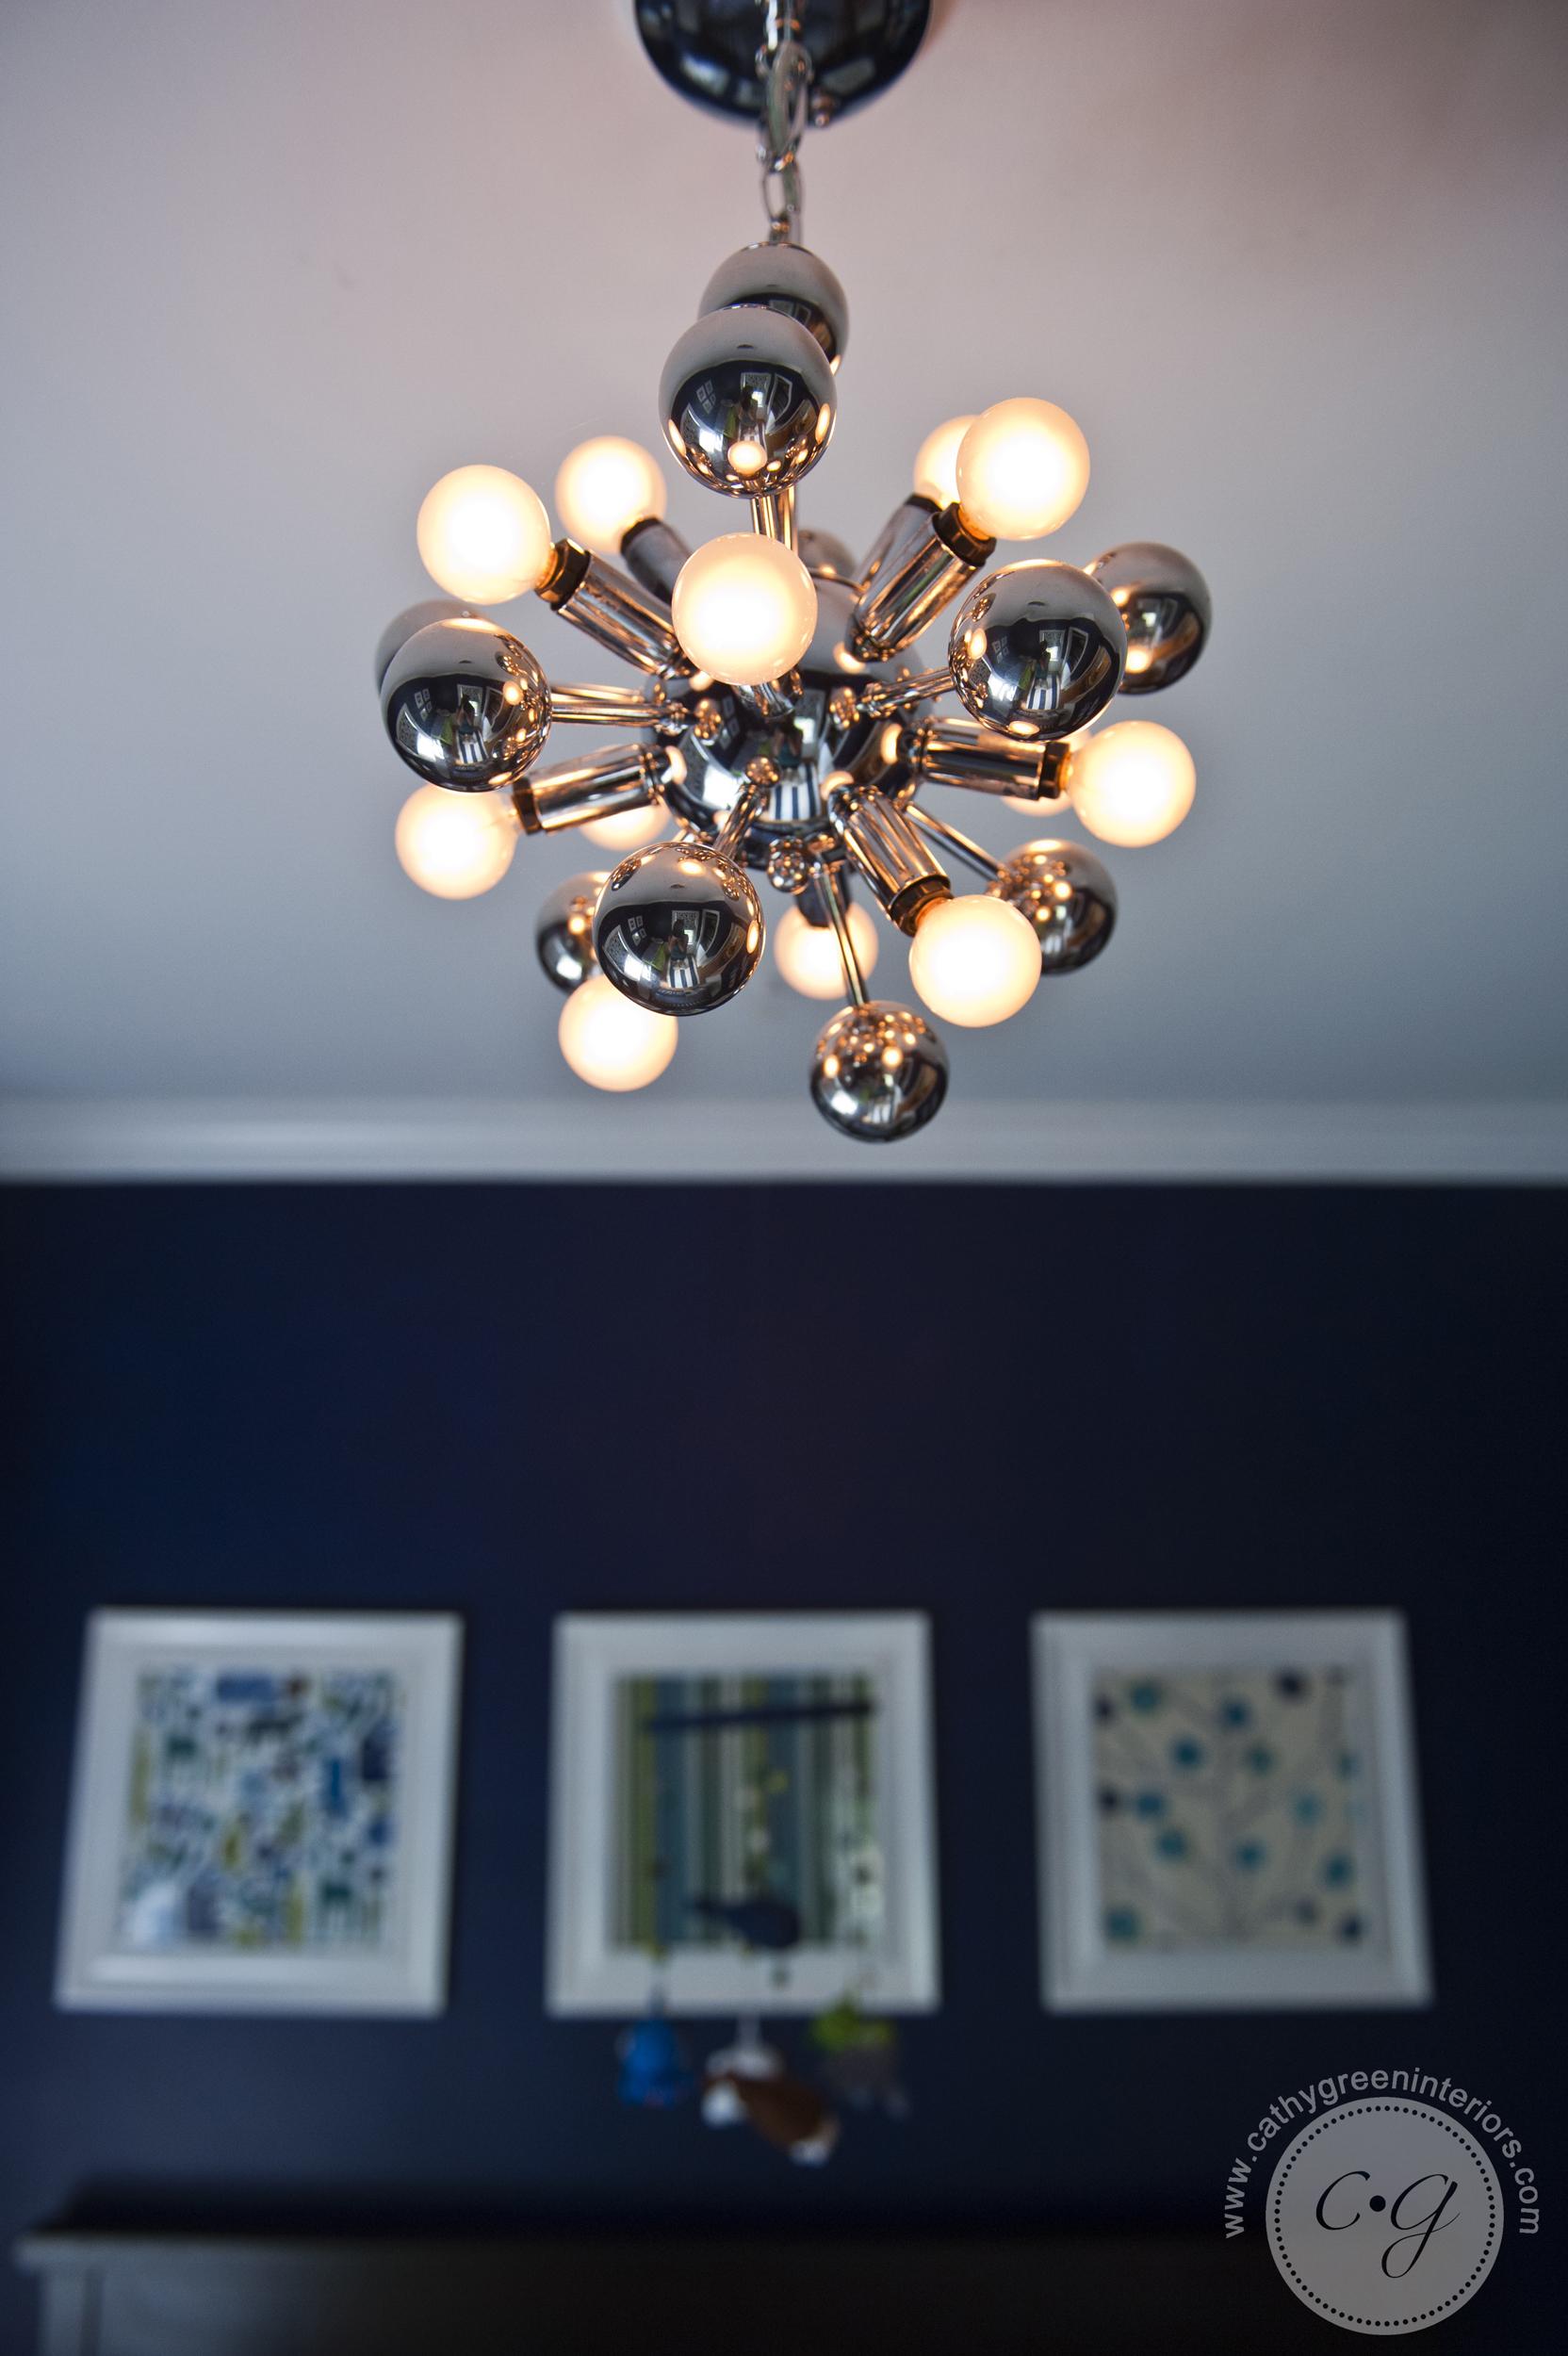 Navy and green nursery atom chandelier - Richmond, VA